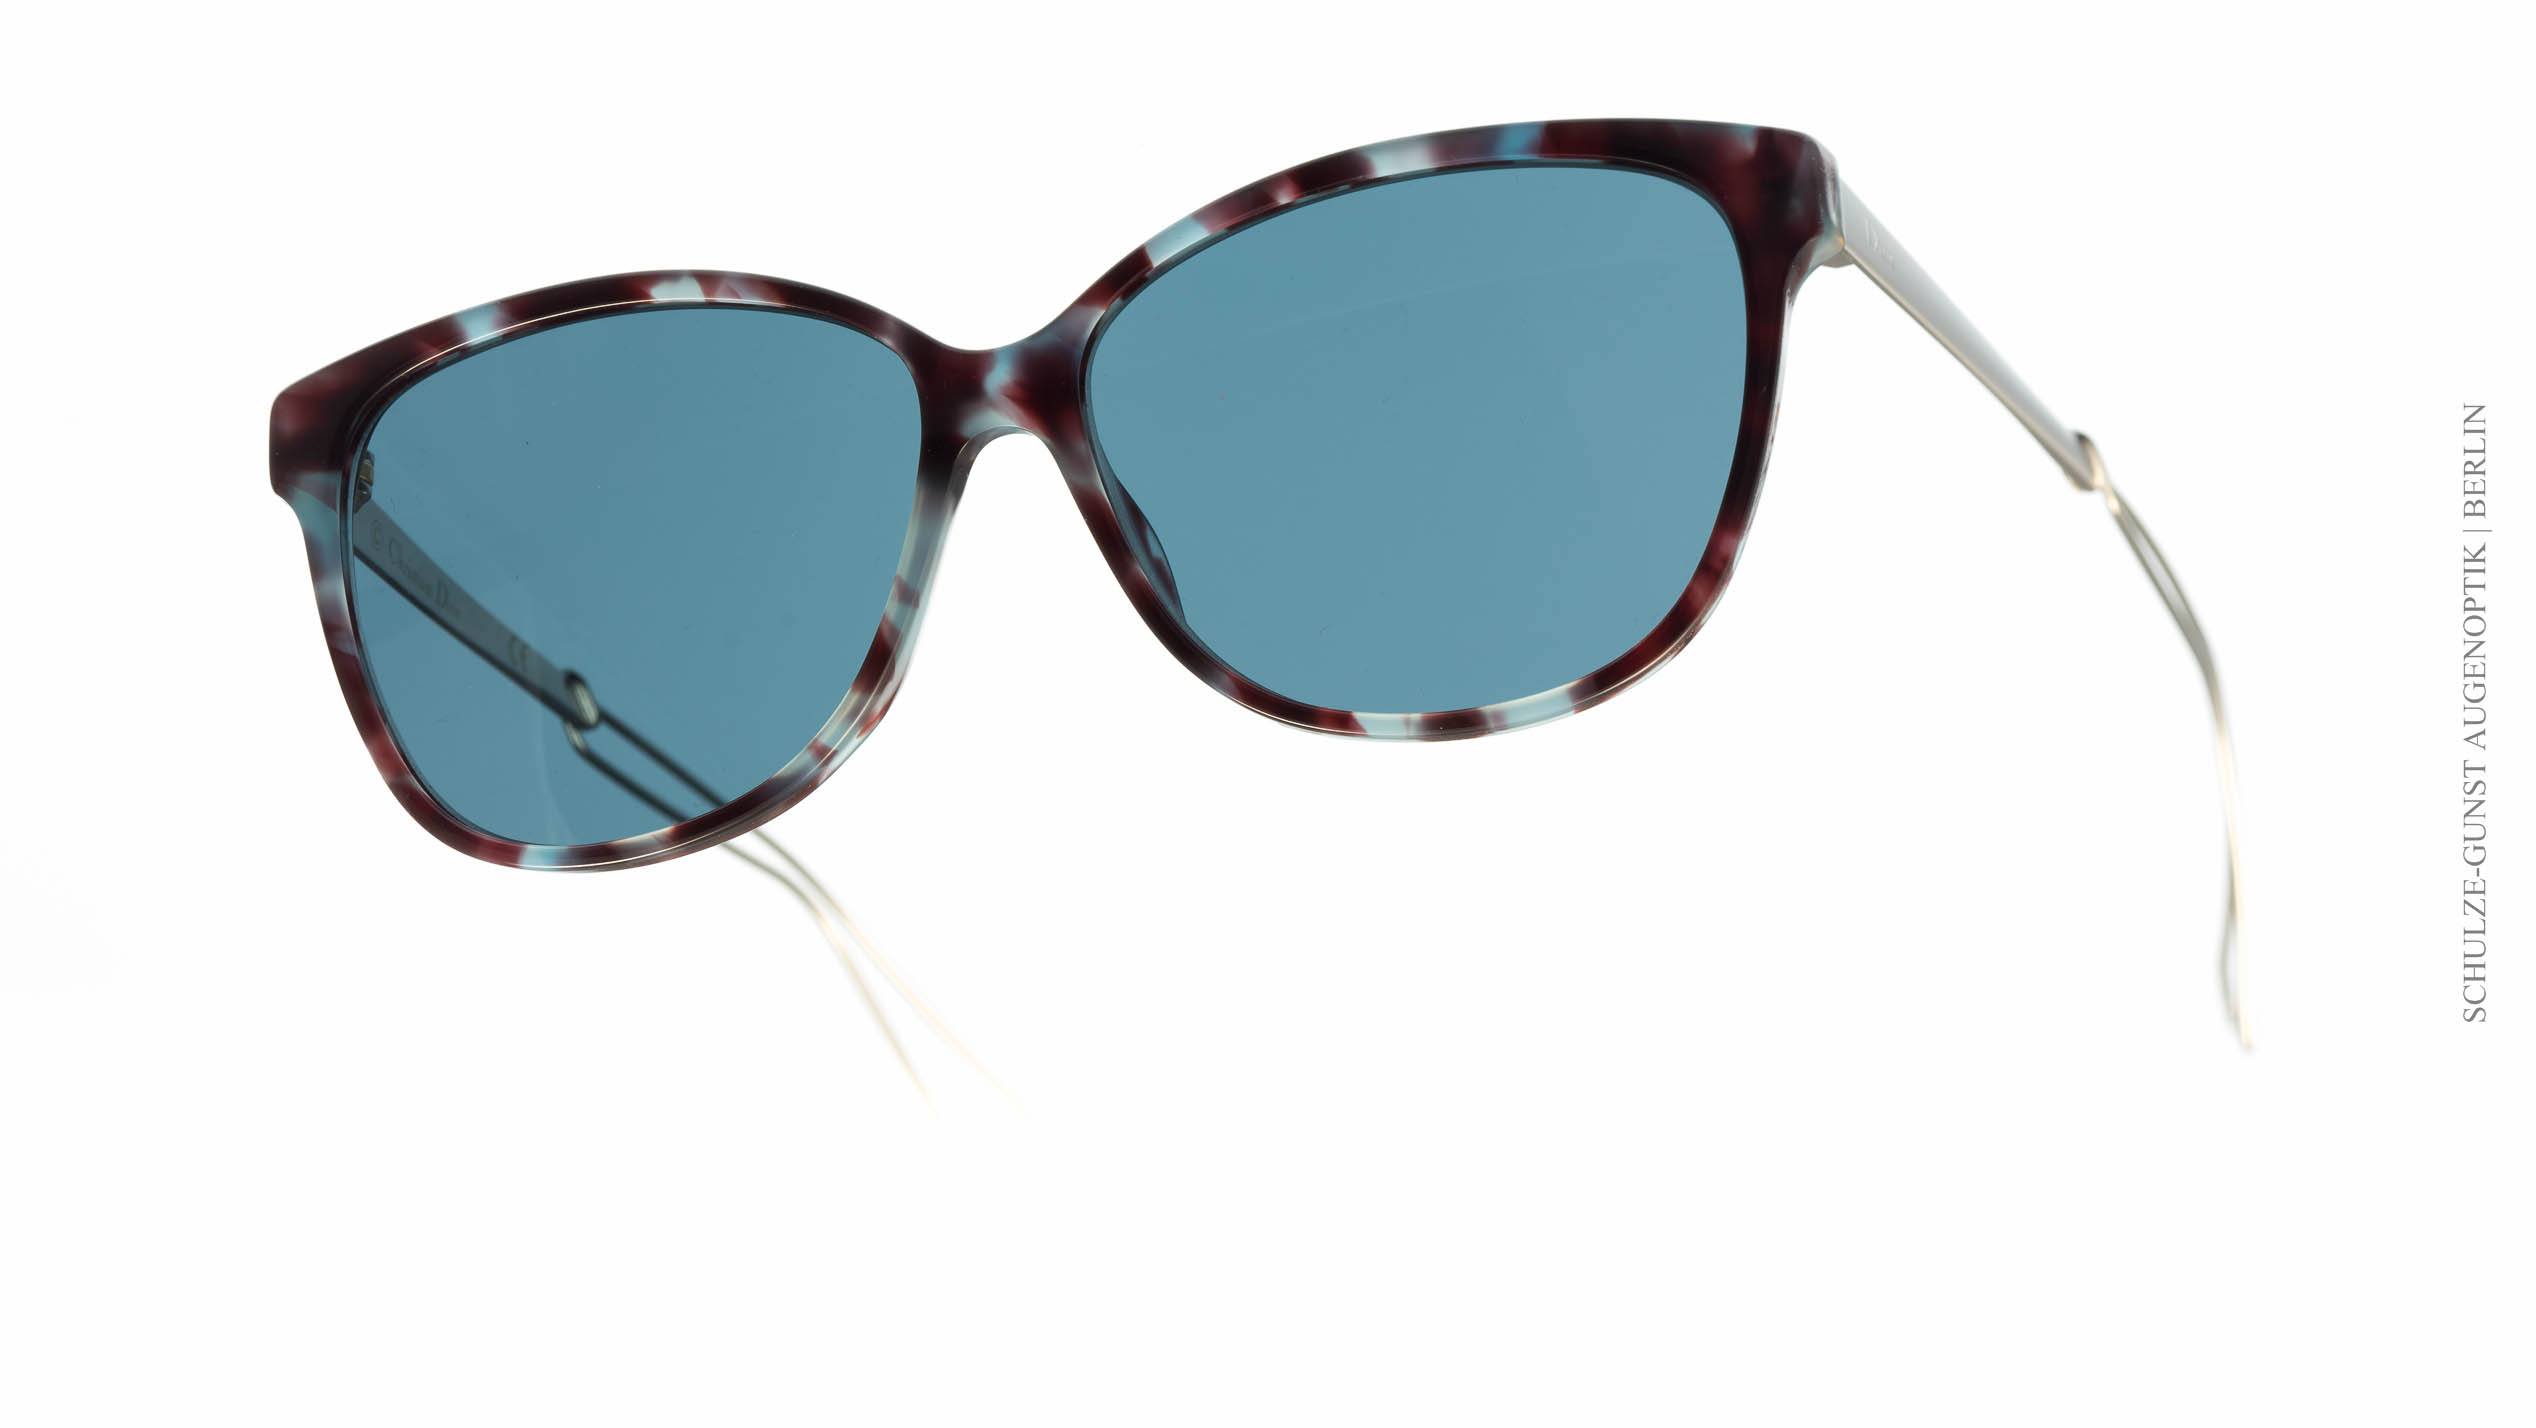 8baa81cfb13aa4 dior-damenbrille Archive - SCHULZE-GUNST Augenoptik seit 1894